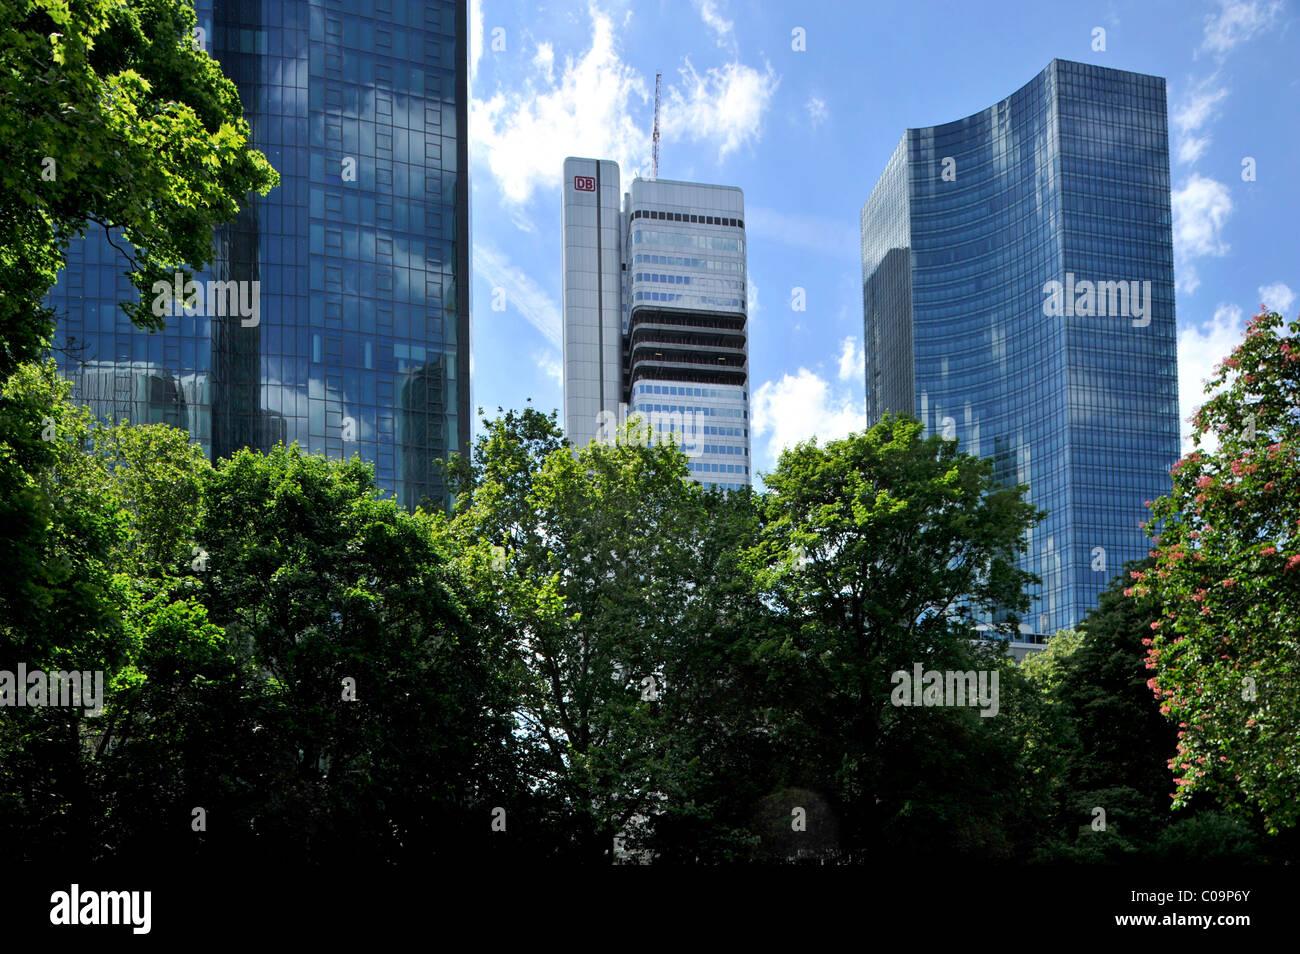 Dresdner Bank headquarters called Gallileo, DB Tower, Skyper building, Taunusanlage park, Financial District, Frankfurt am Main Stock Photo